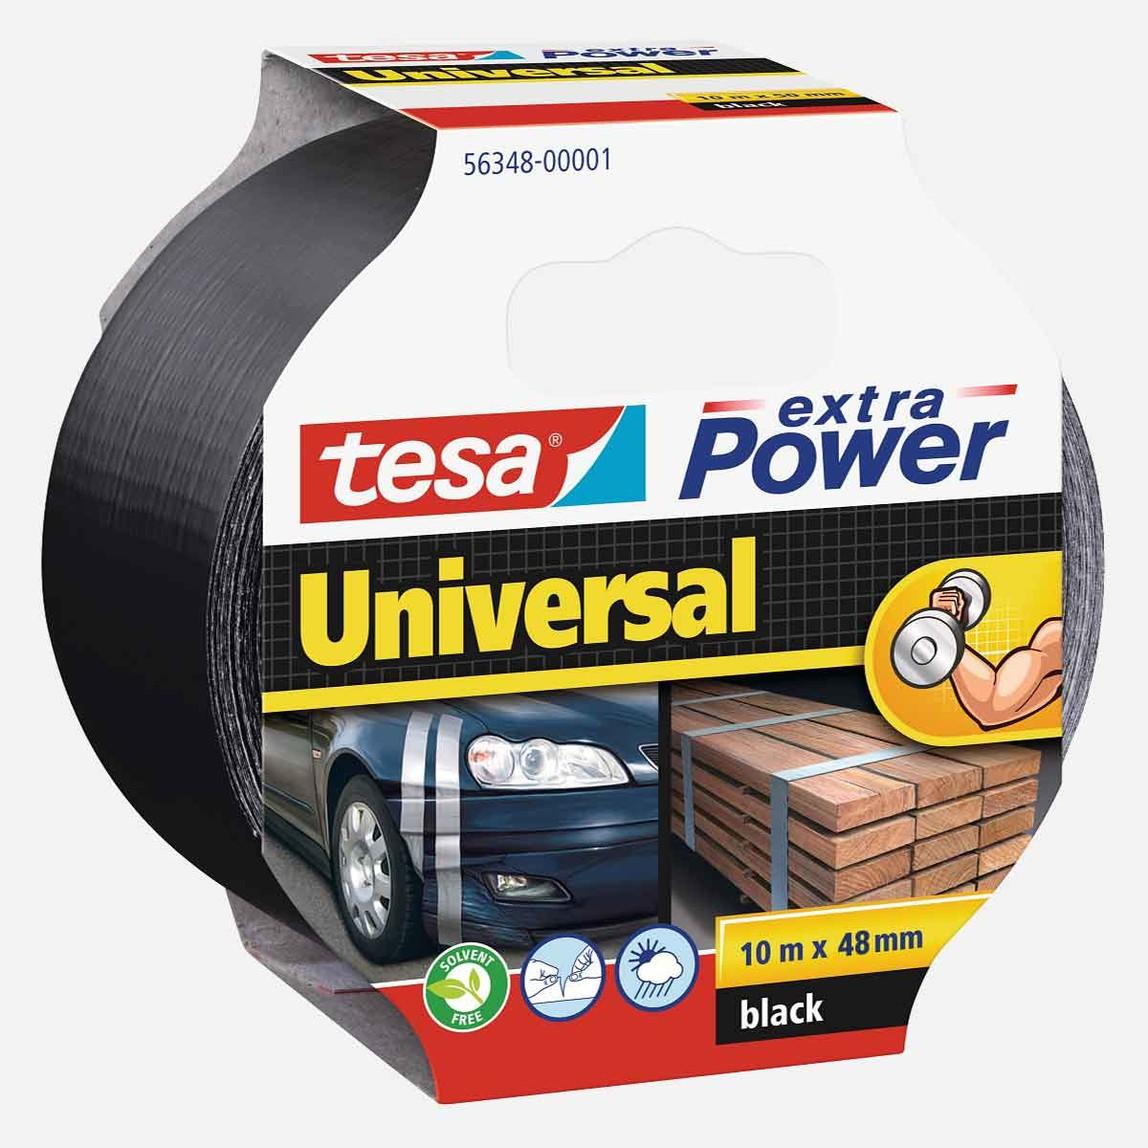 Tesa Extra Power Universal Duct Bant